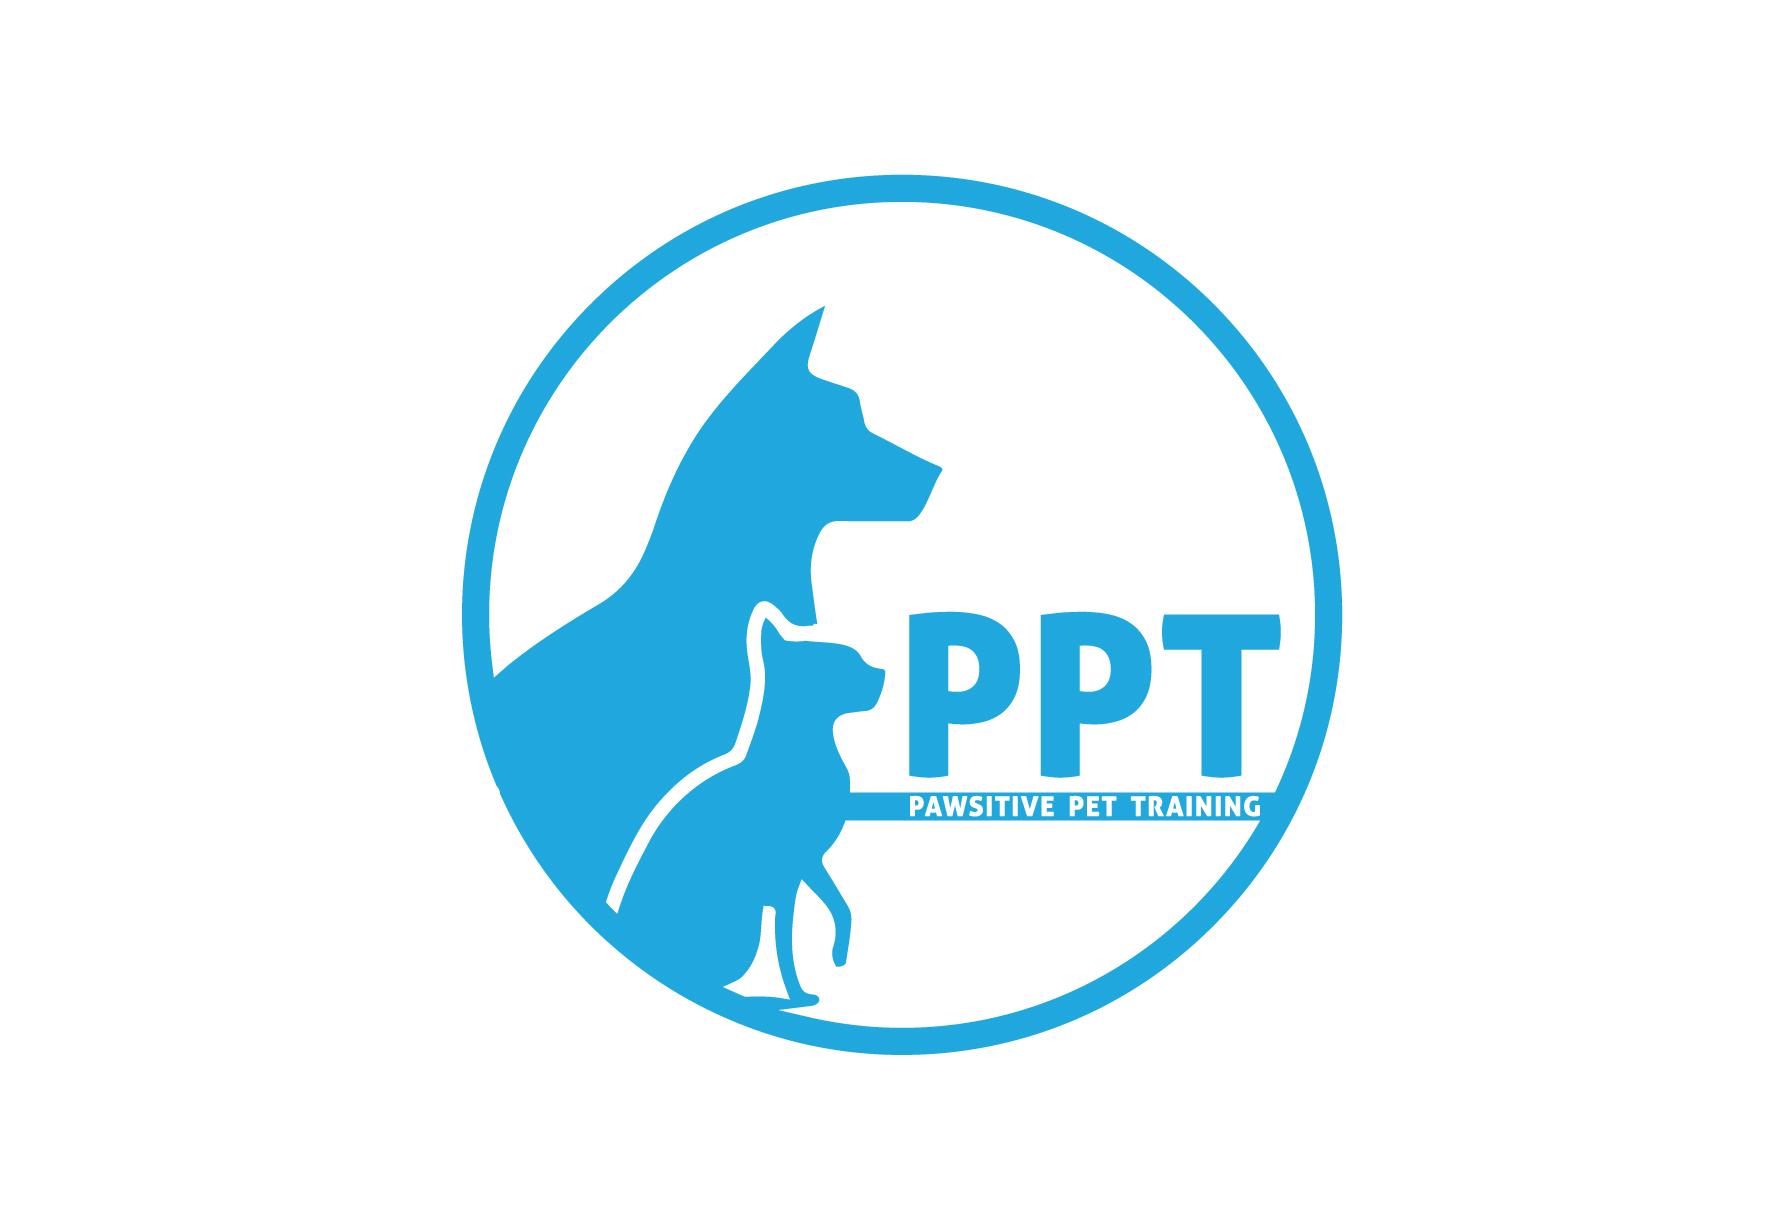 Pawsitive Pet Training